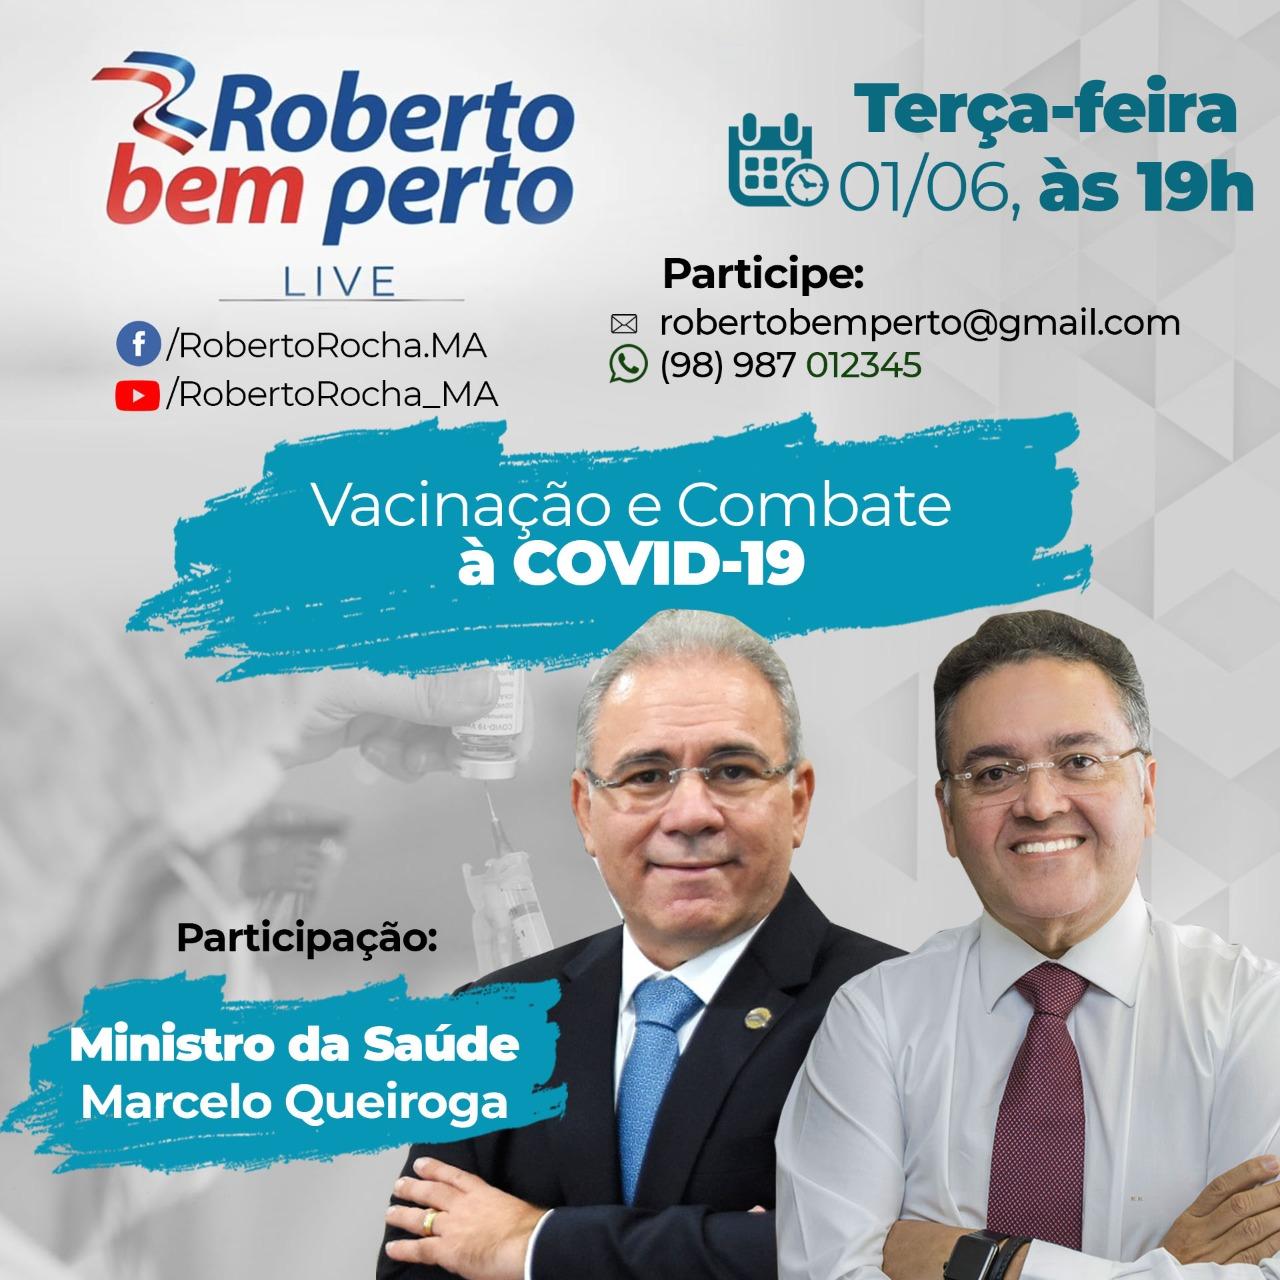 Ministro da saúde participa de live do senador Roberto Rocha nesta terça-feira